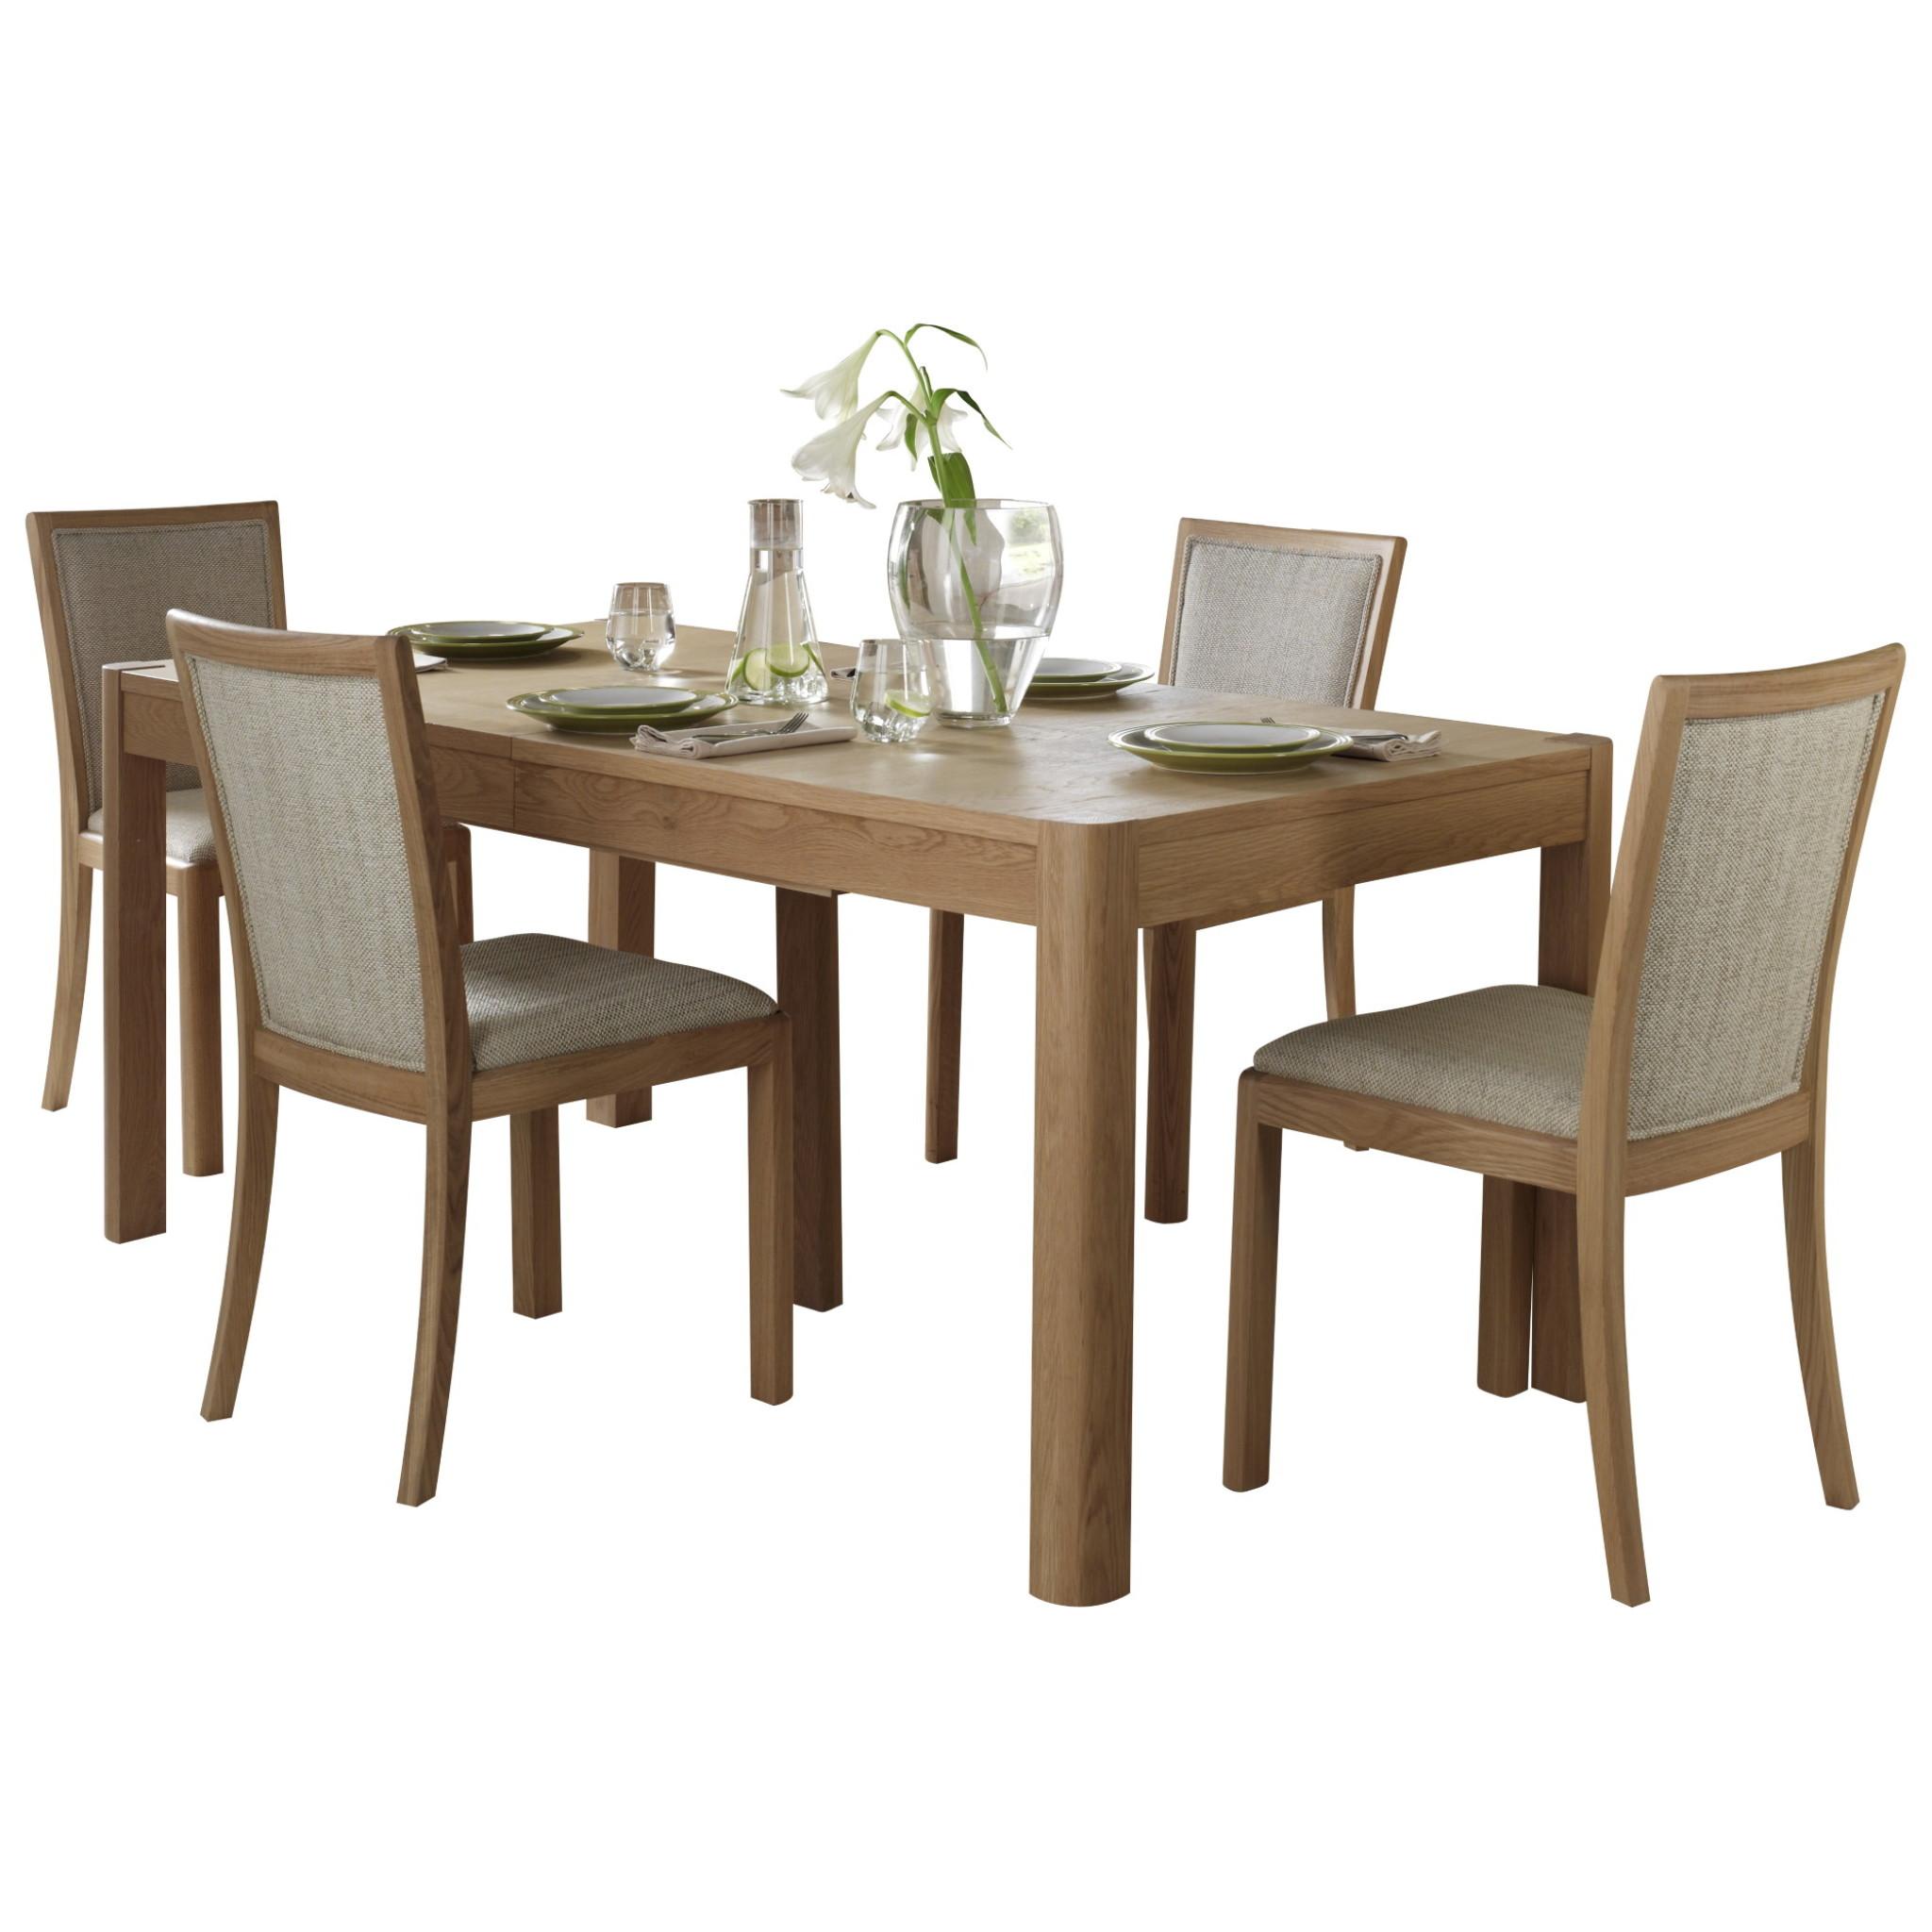 Superb Stockholm 90Cm Extending Dining Table Winsor Furniture Wn217C Dailytribune Chair Design For Home Dailytribuneorg